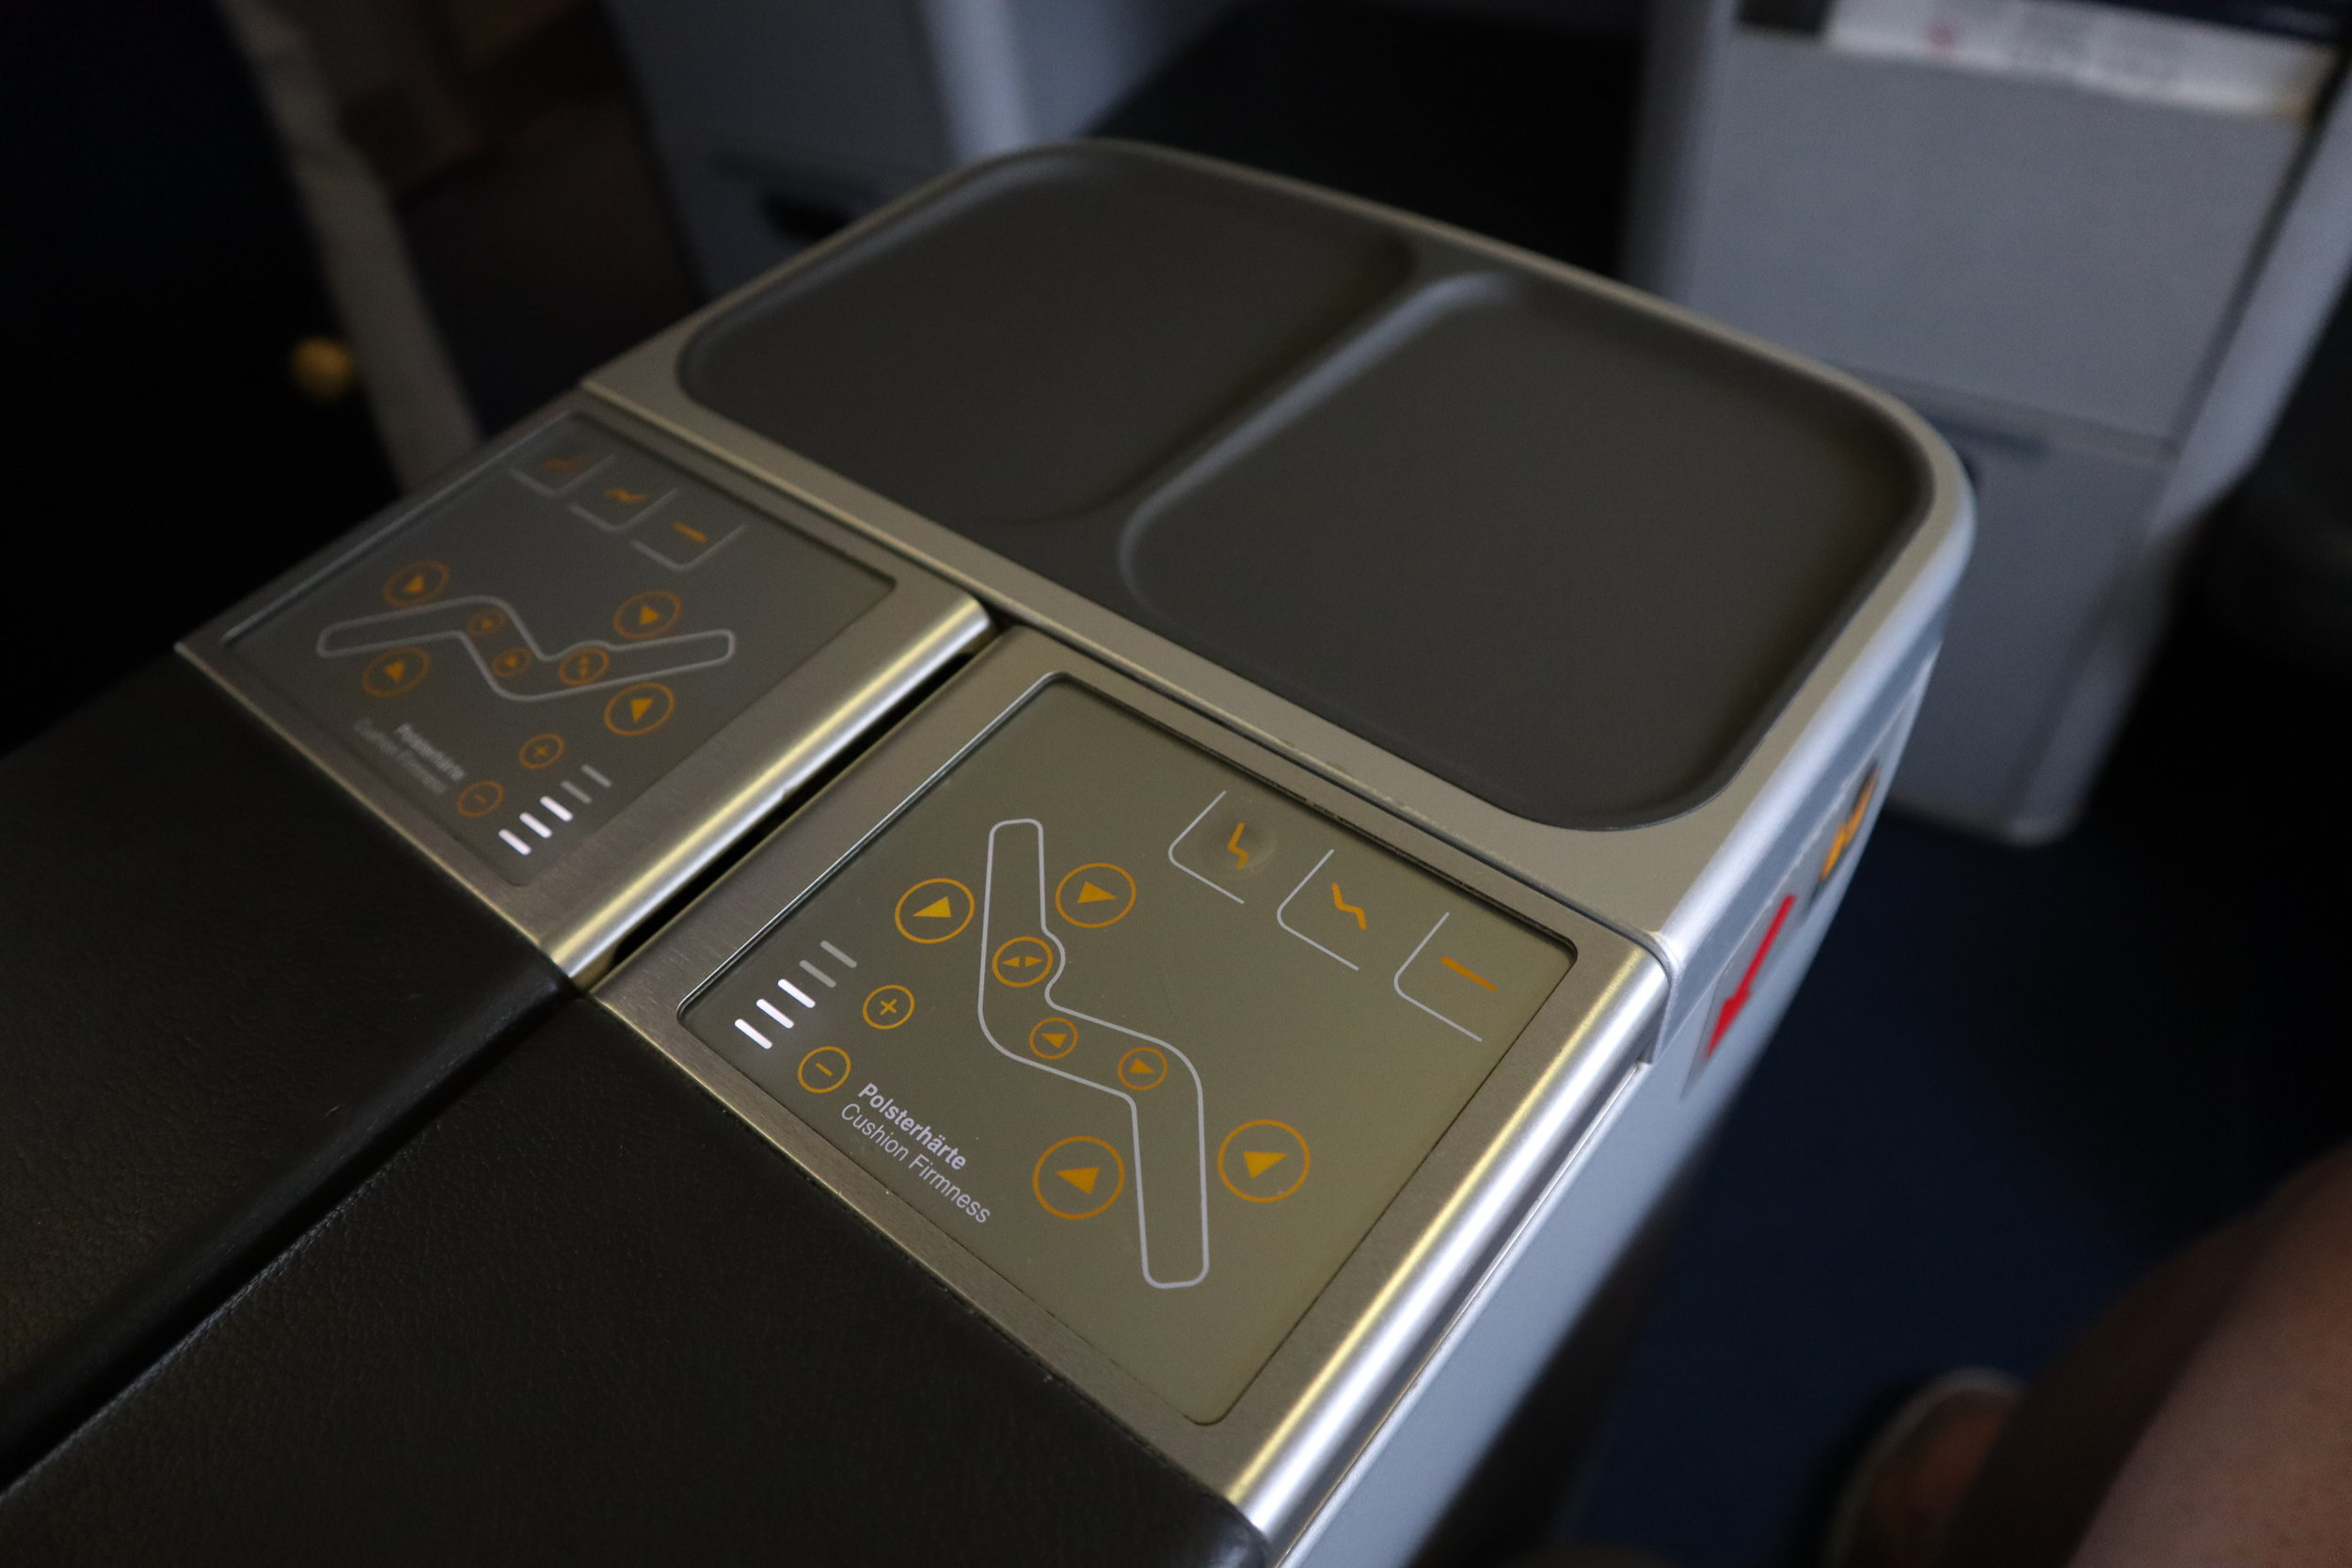 Lufthansa 747-400 business class – Seat controls